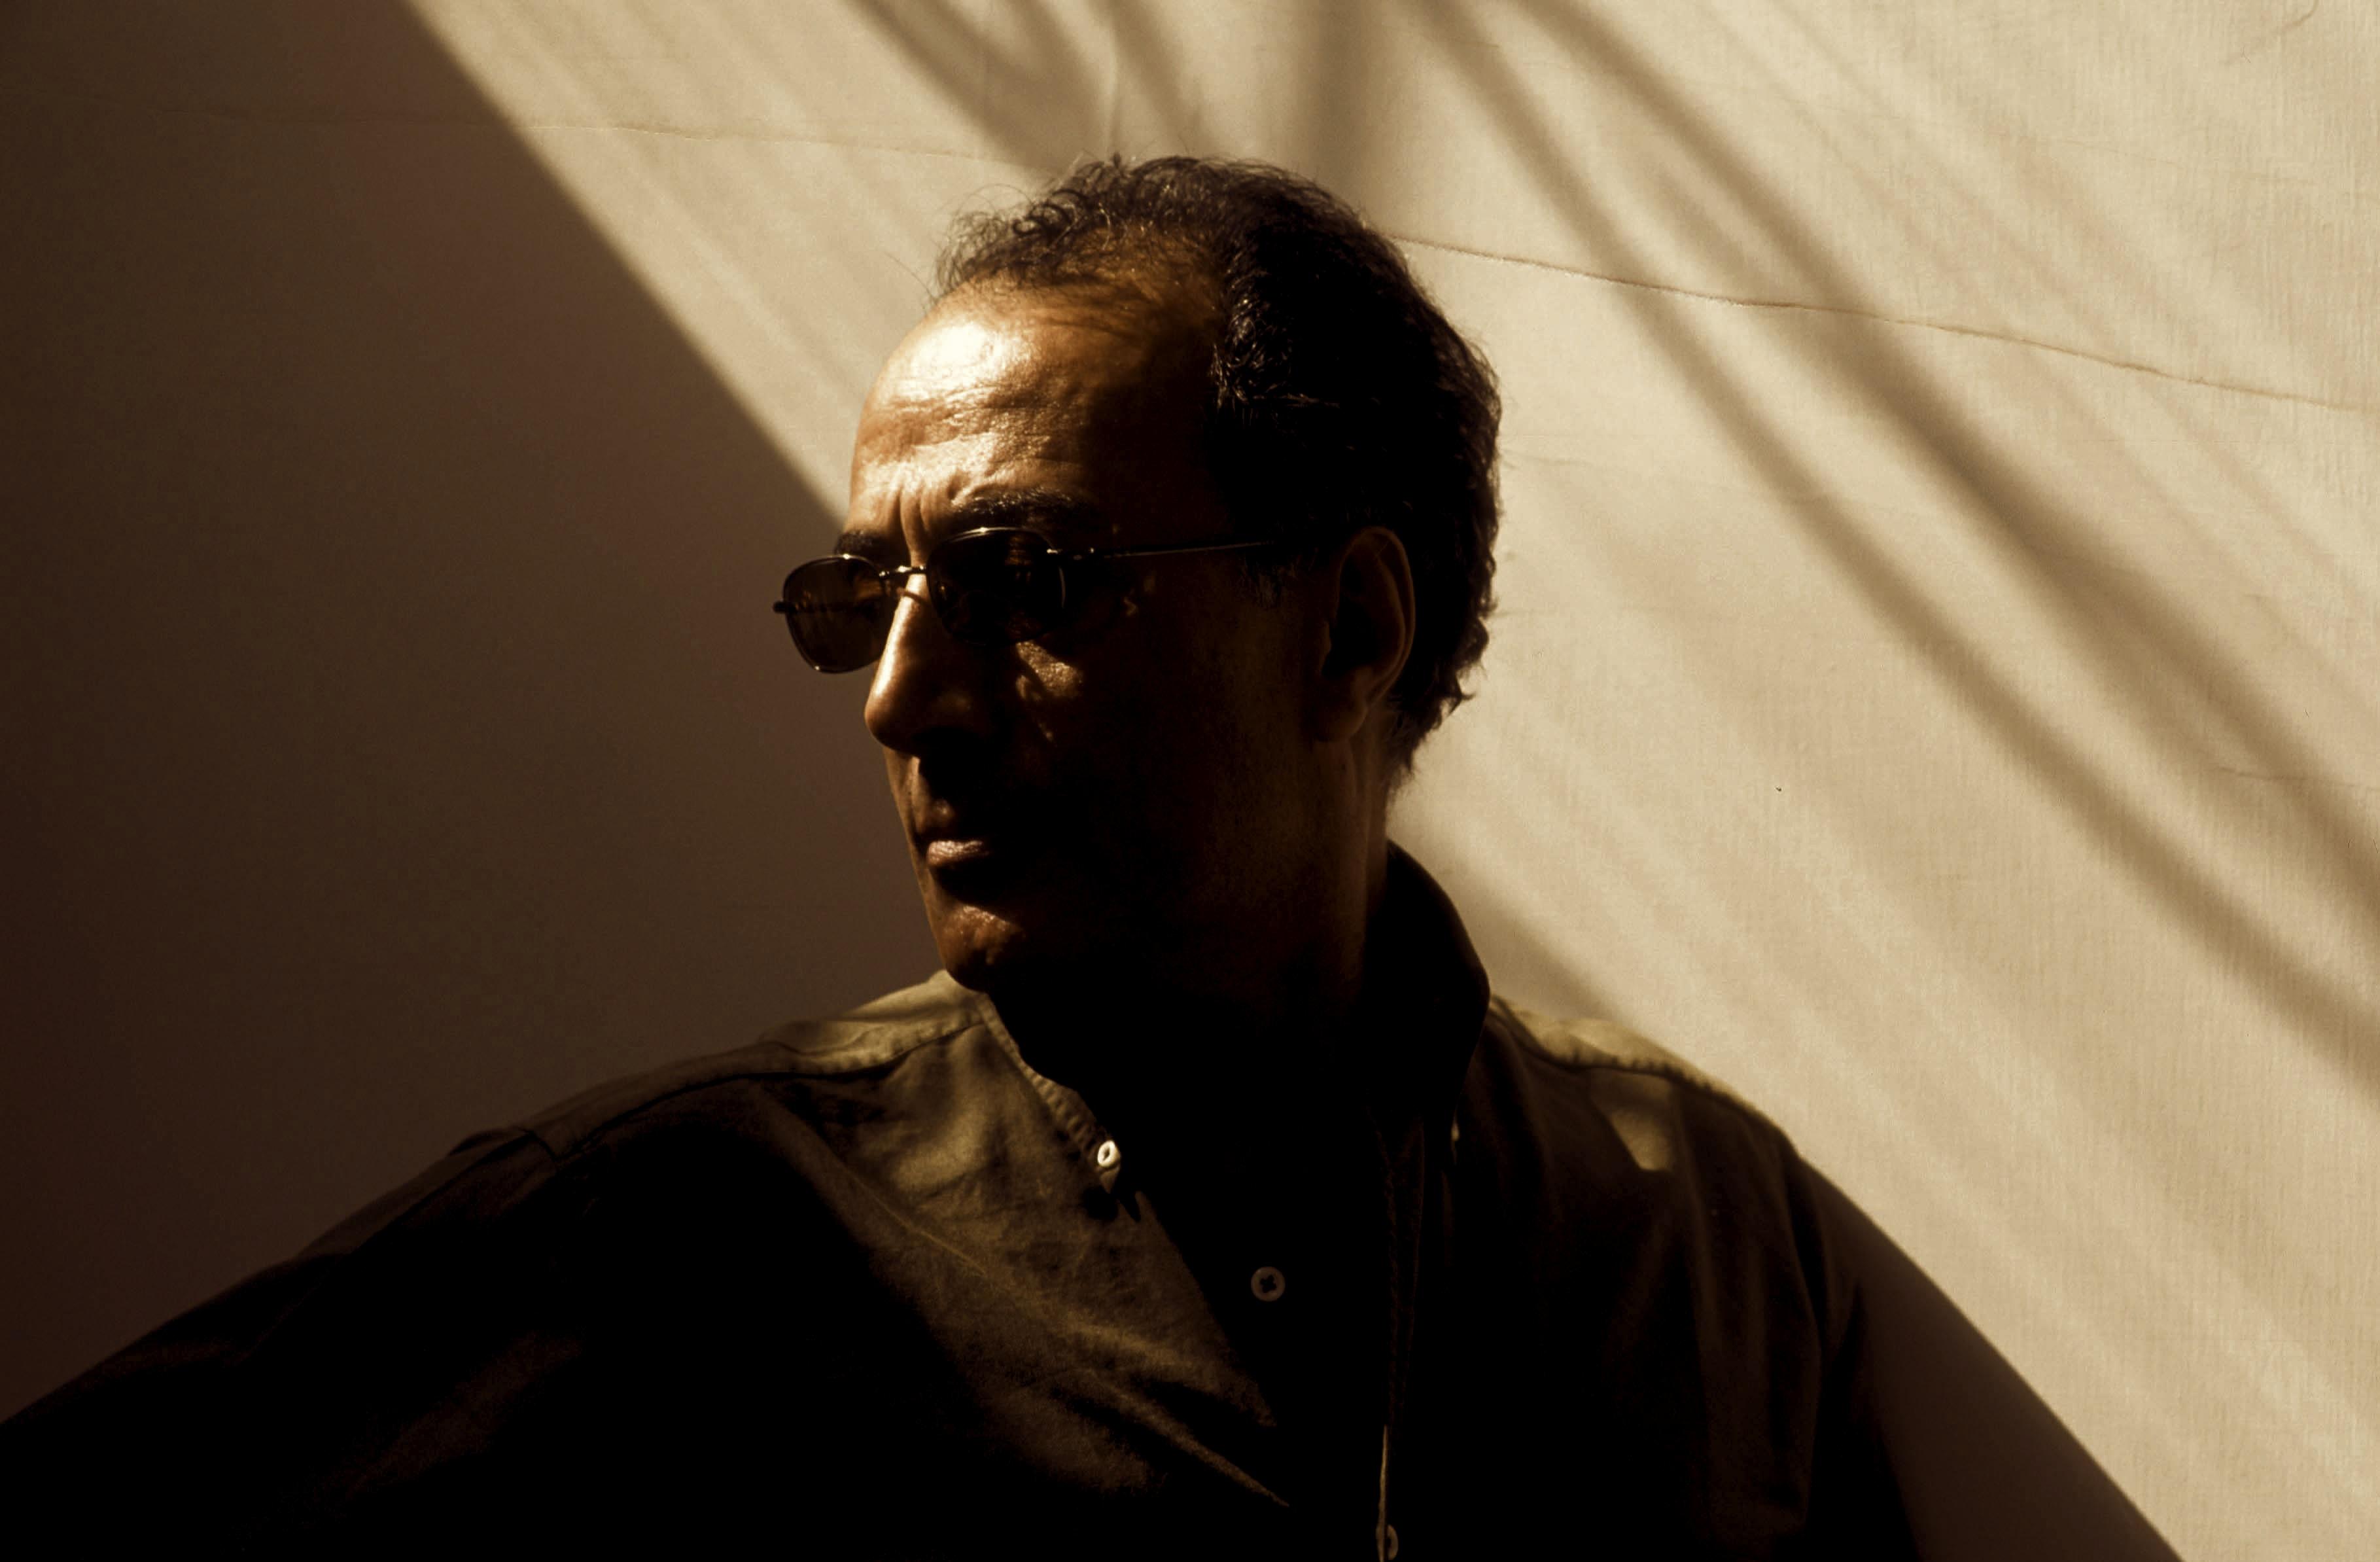 Abbas Kiarostami * 22. Juni 1940 in Teheran; † 4. Juli 2016 in Paris